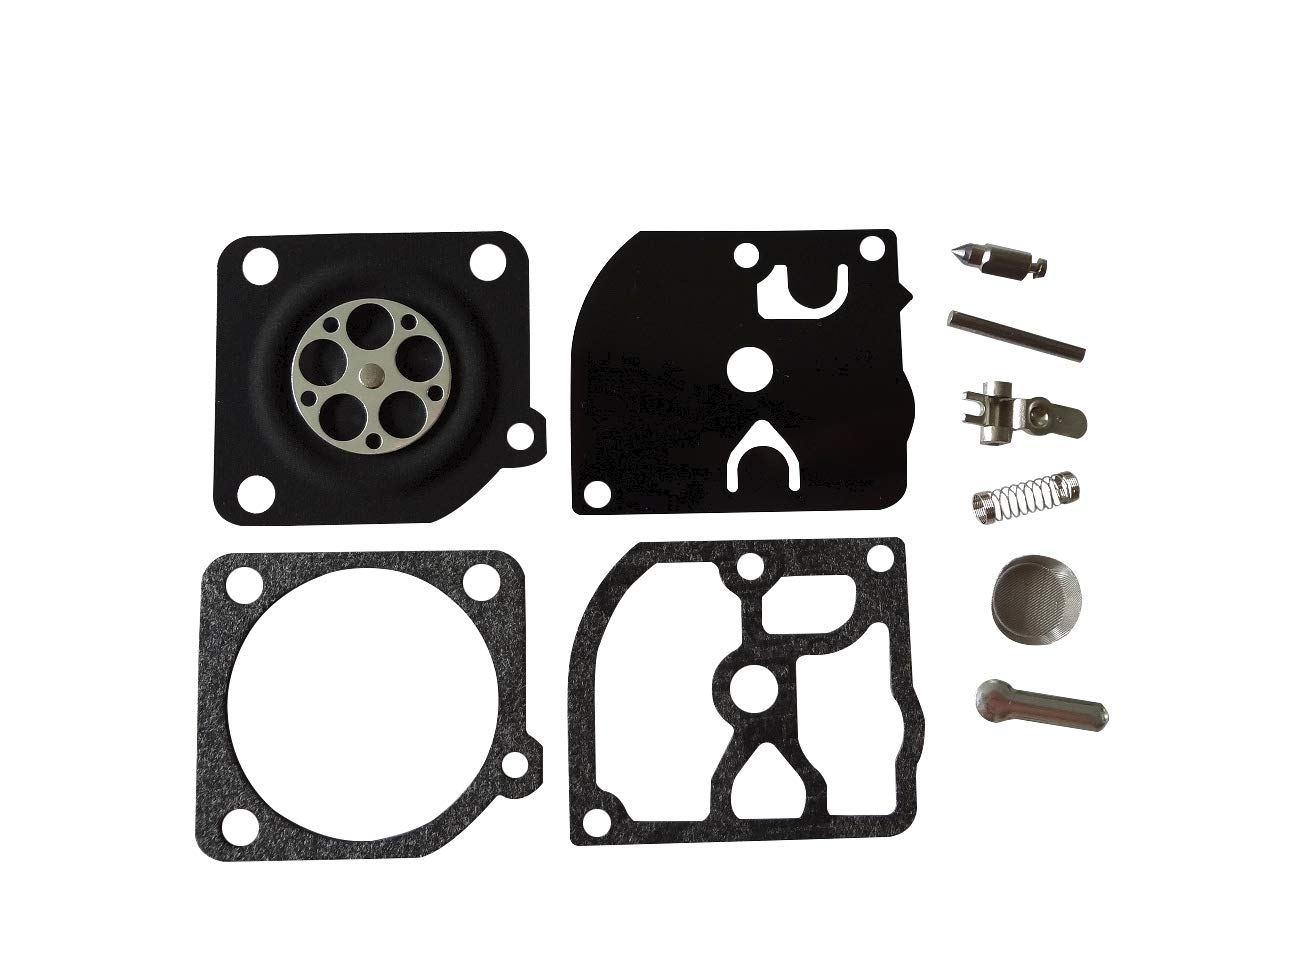 Carburetor Repair/Rebuild Kit Replaces ZAMA RB-39 for Zama C1Q Carburetors Homelite 250 McCulloch 38cc 35cc 32cc Chainsaw Eager Beaver 3214 by CTS (Image #1)